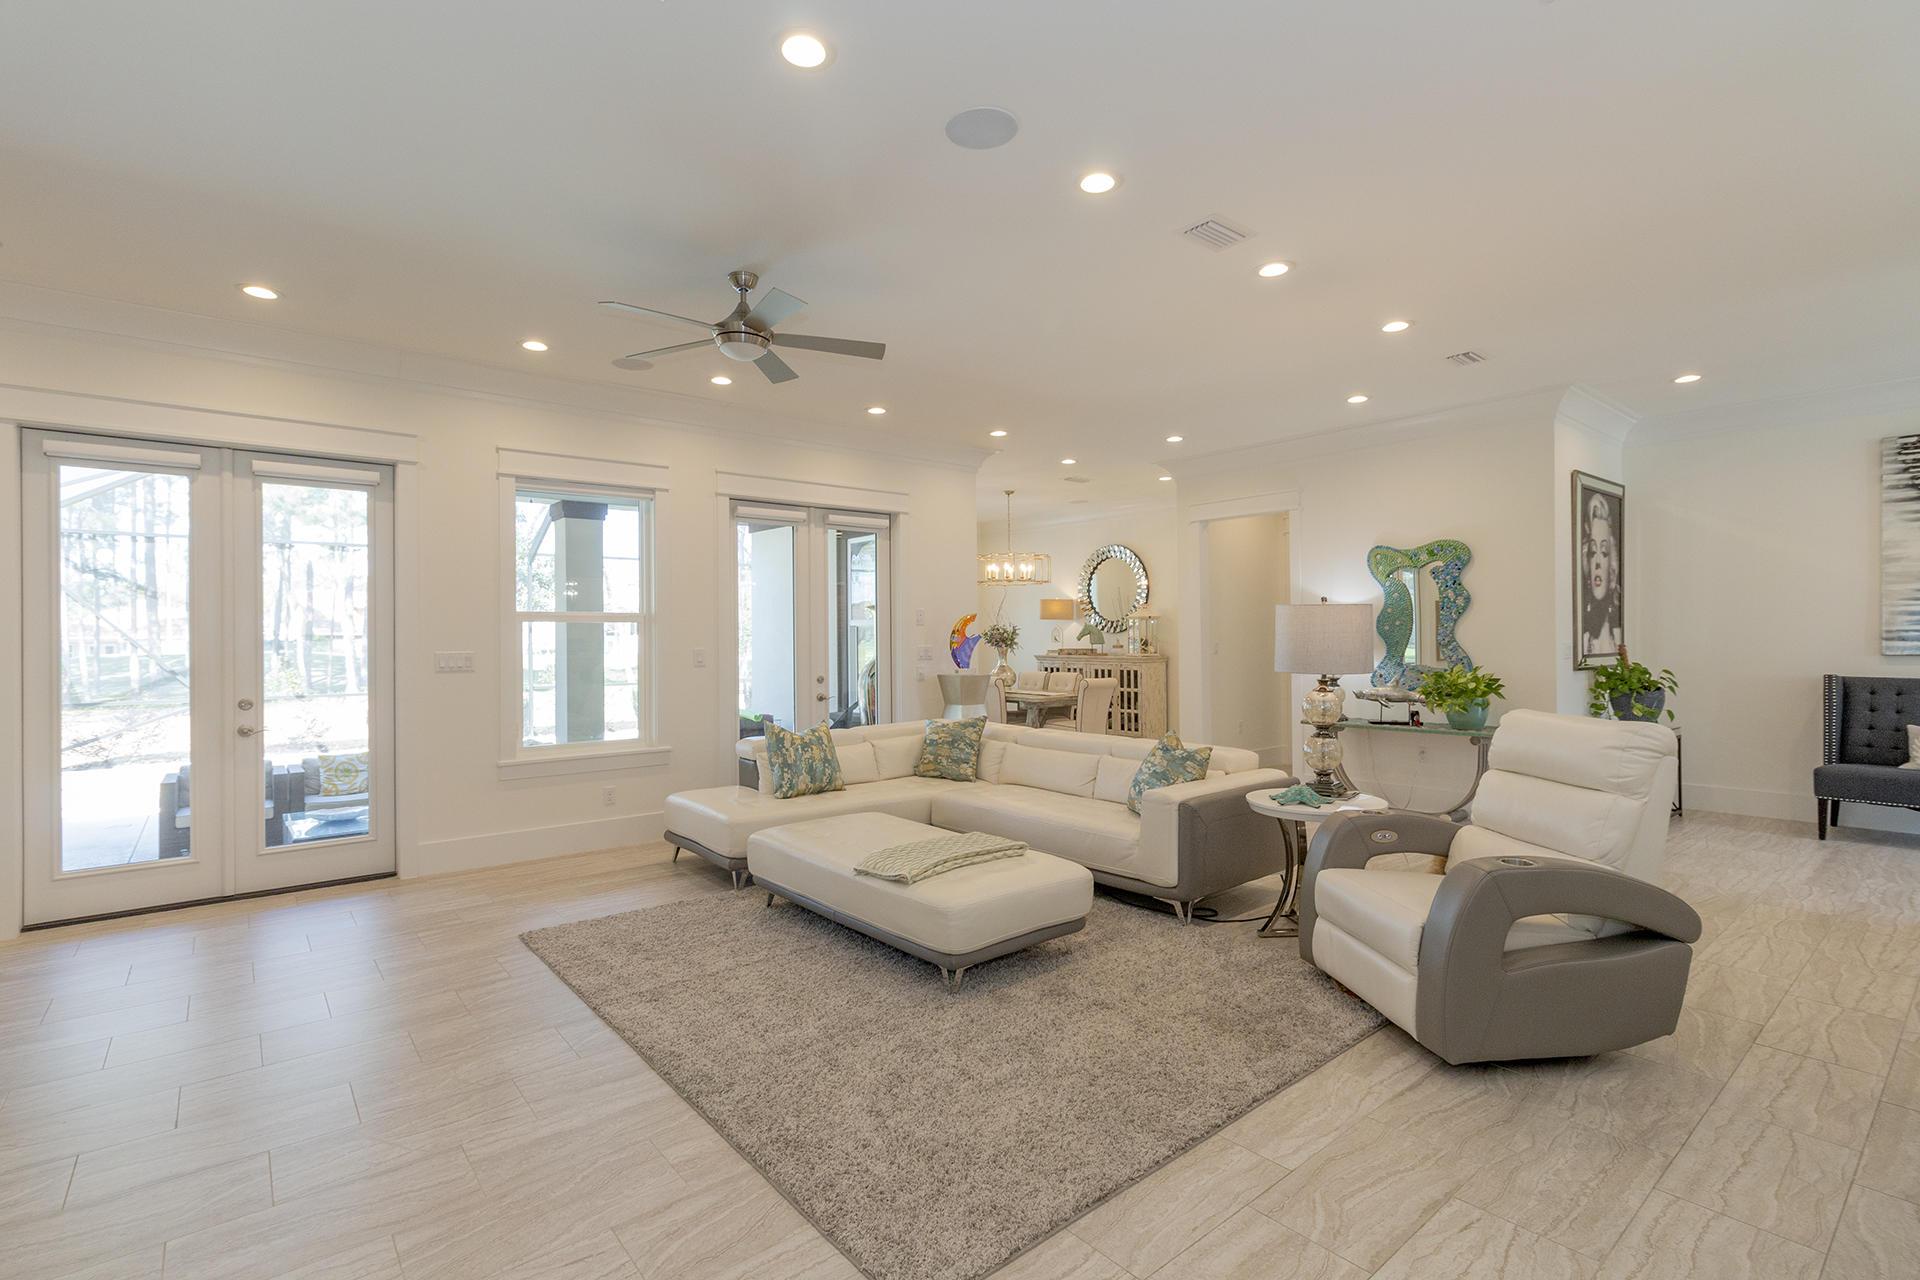 45 Azure Place - $795000